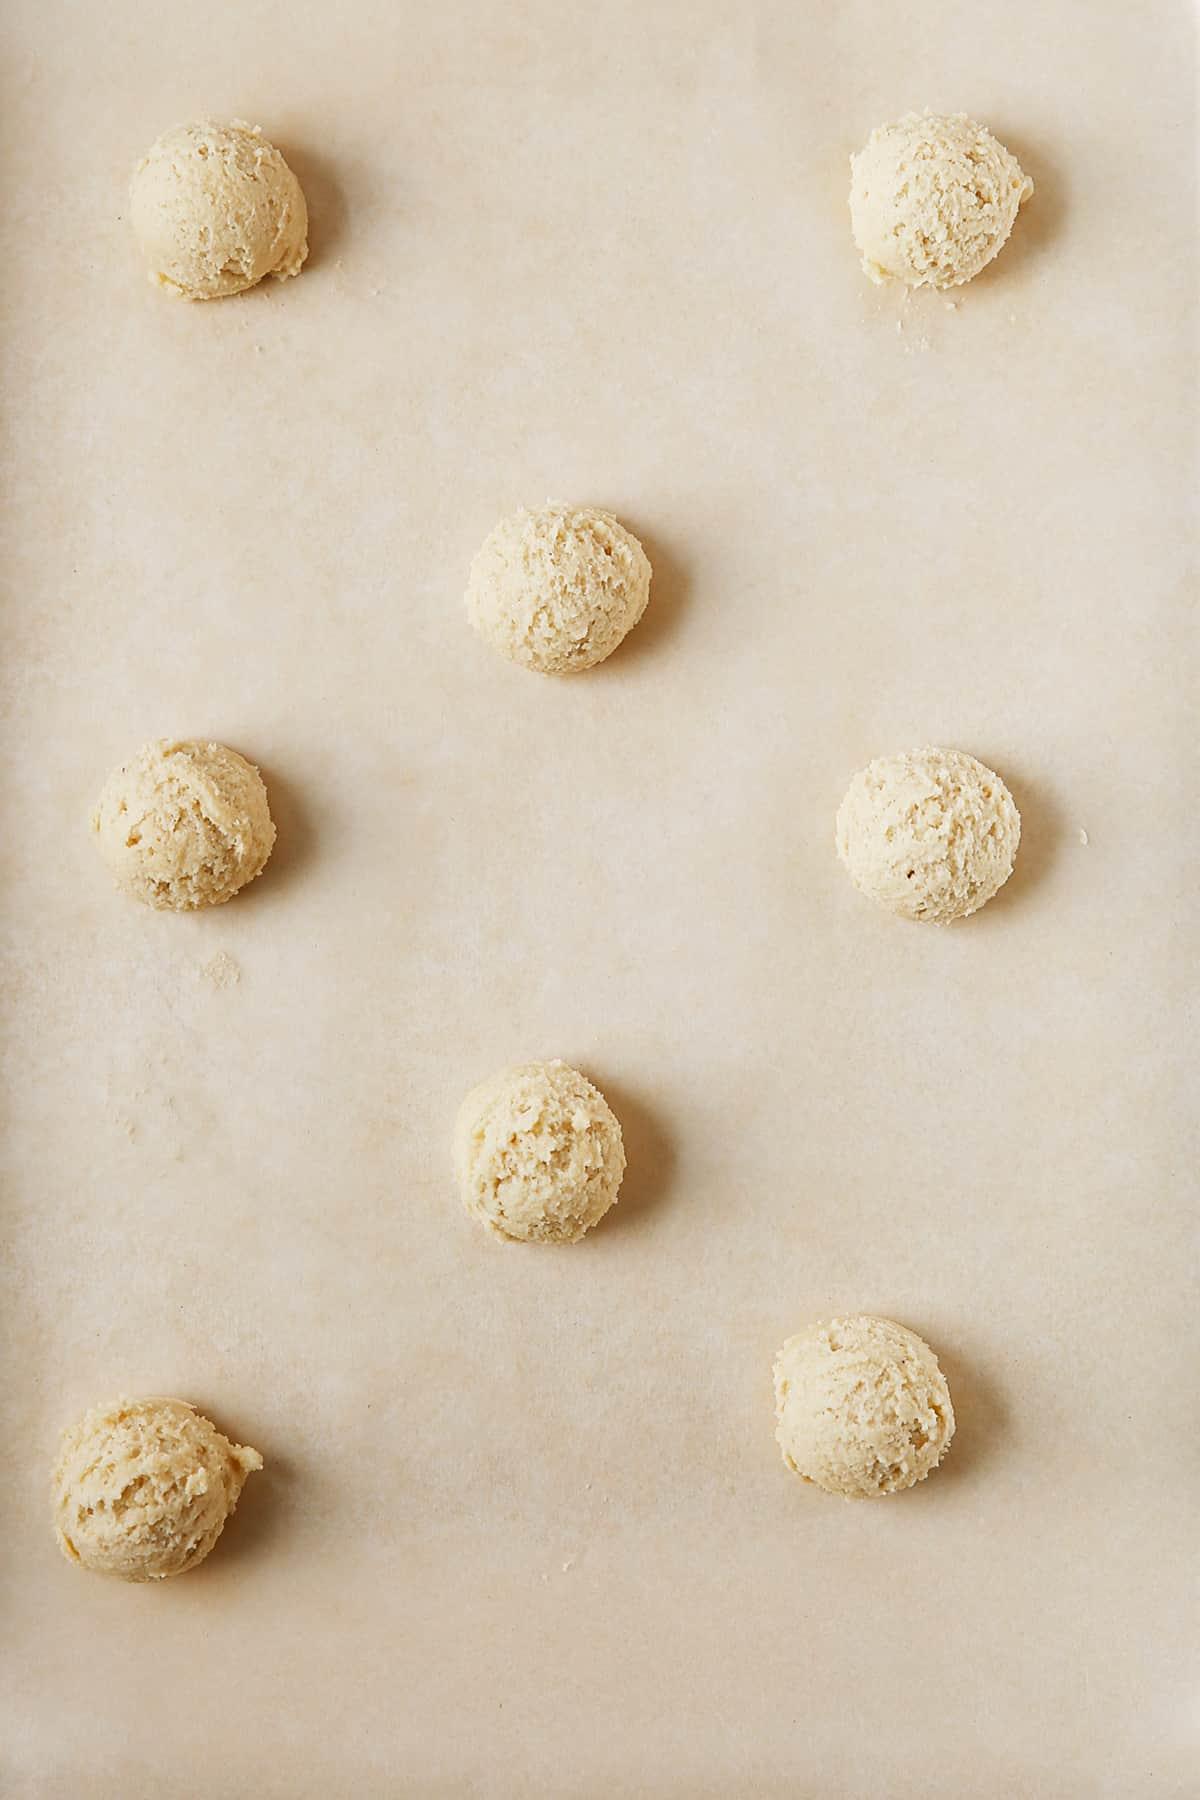 Gluten free sugar cookie dough on a baking sheet